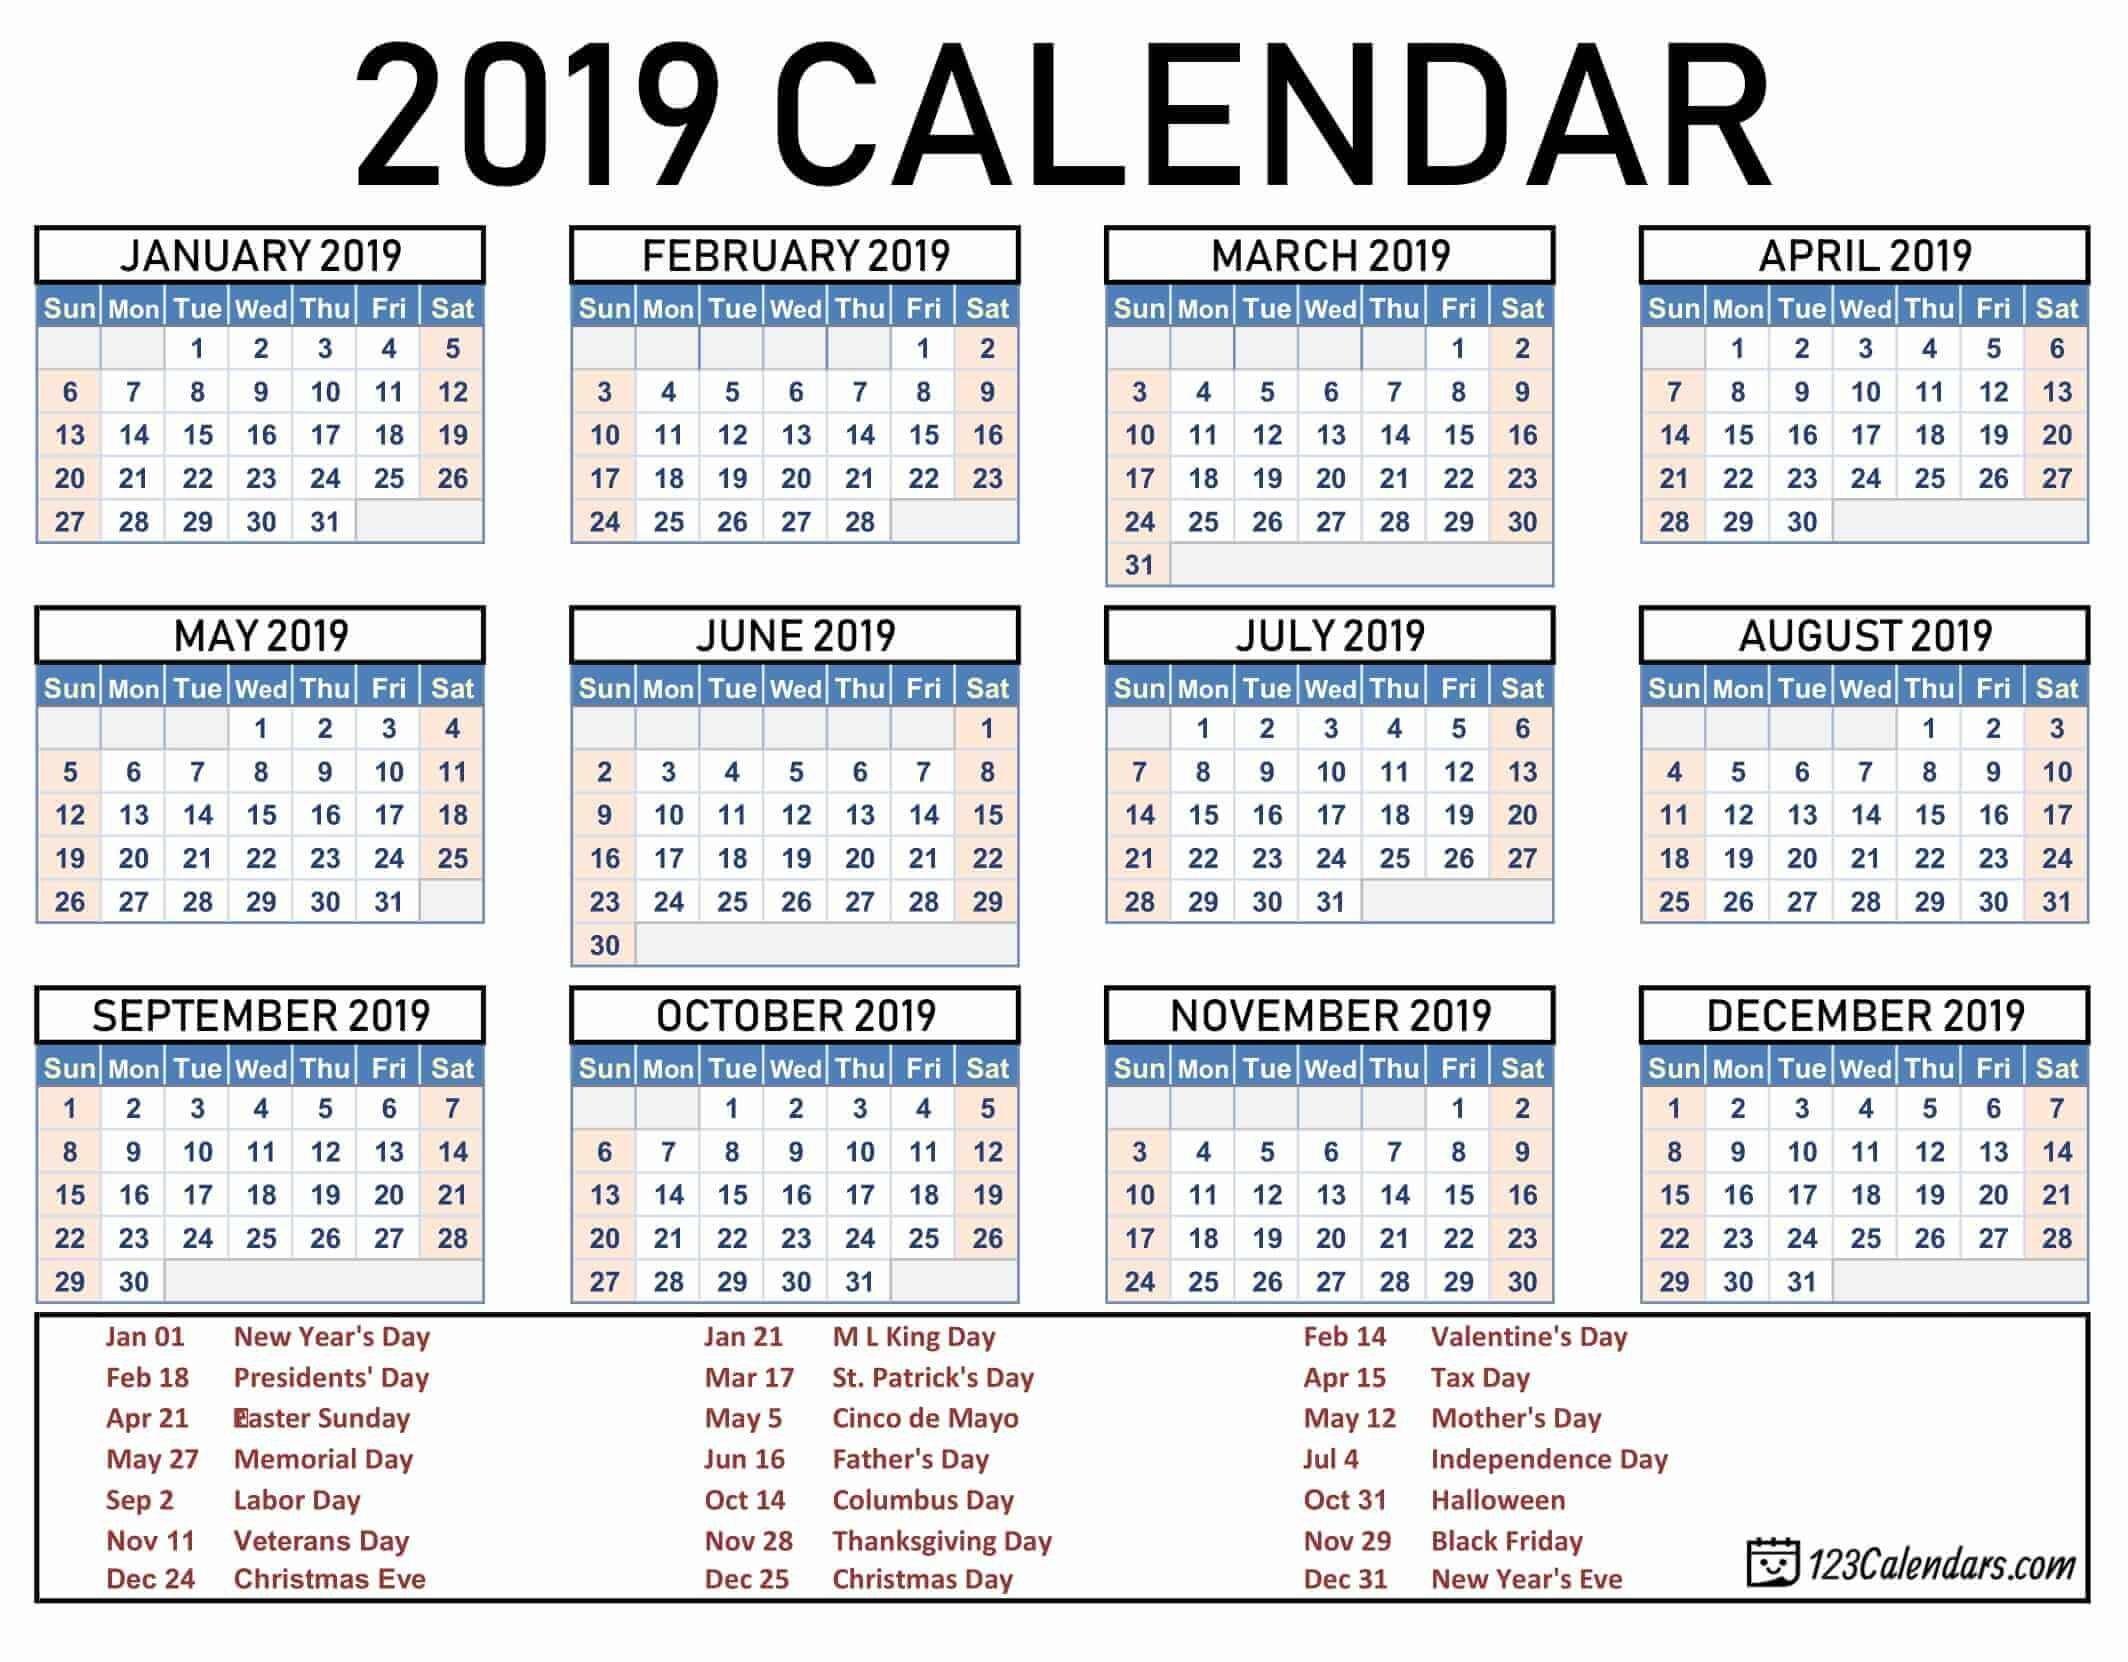 Year 2019 Printable Calendar Templates – 123Calendars Calendar Of 2019